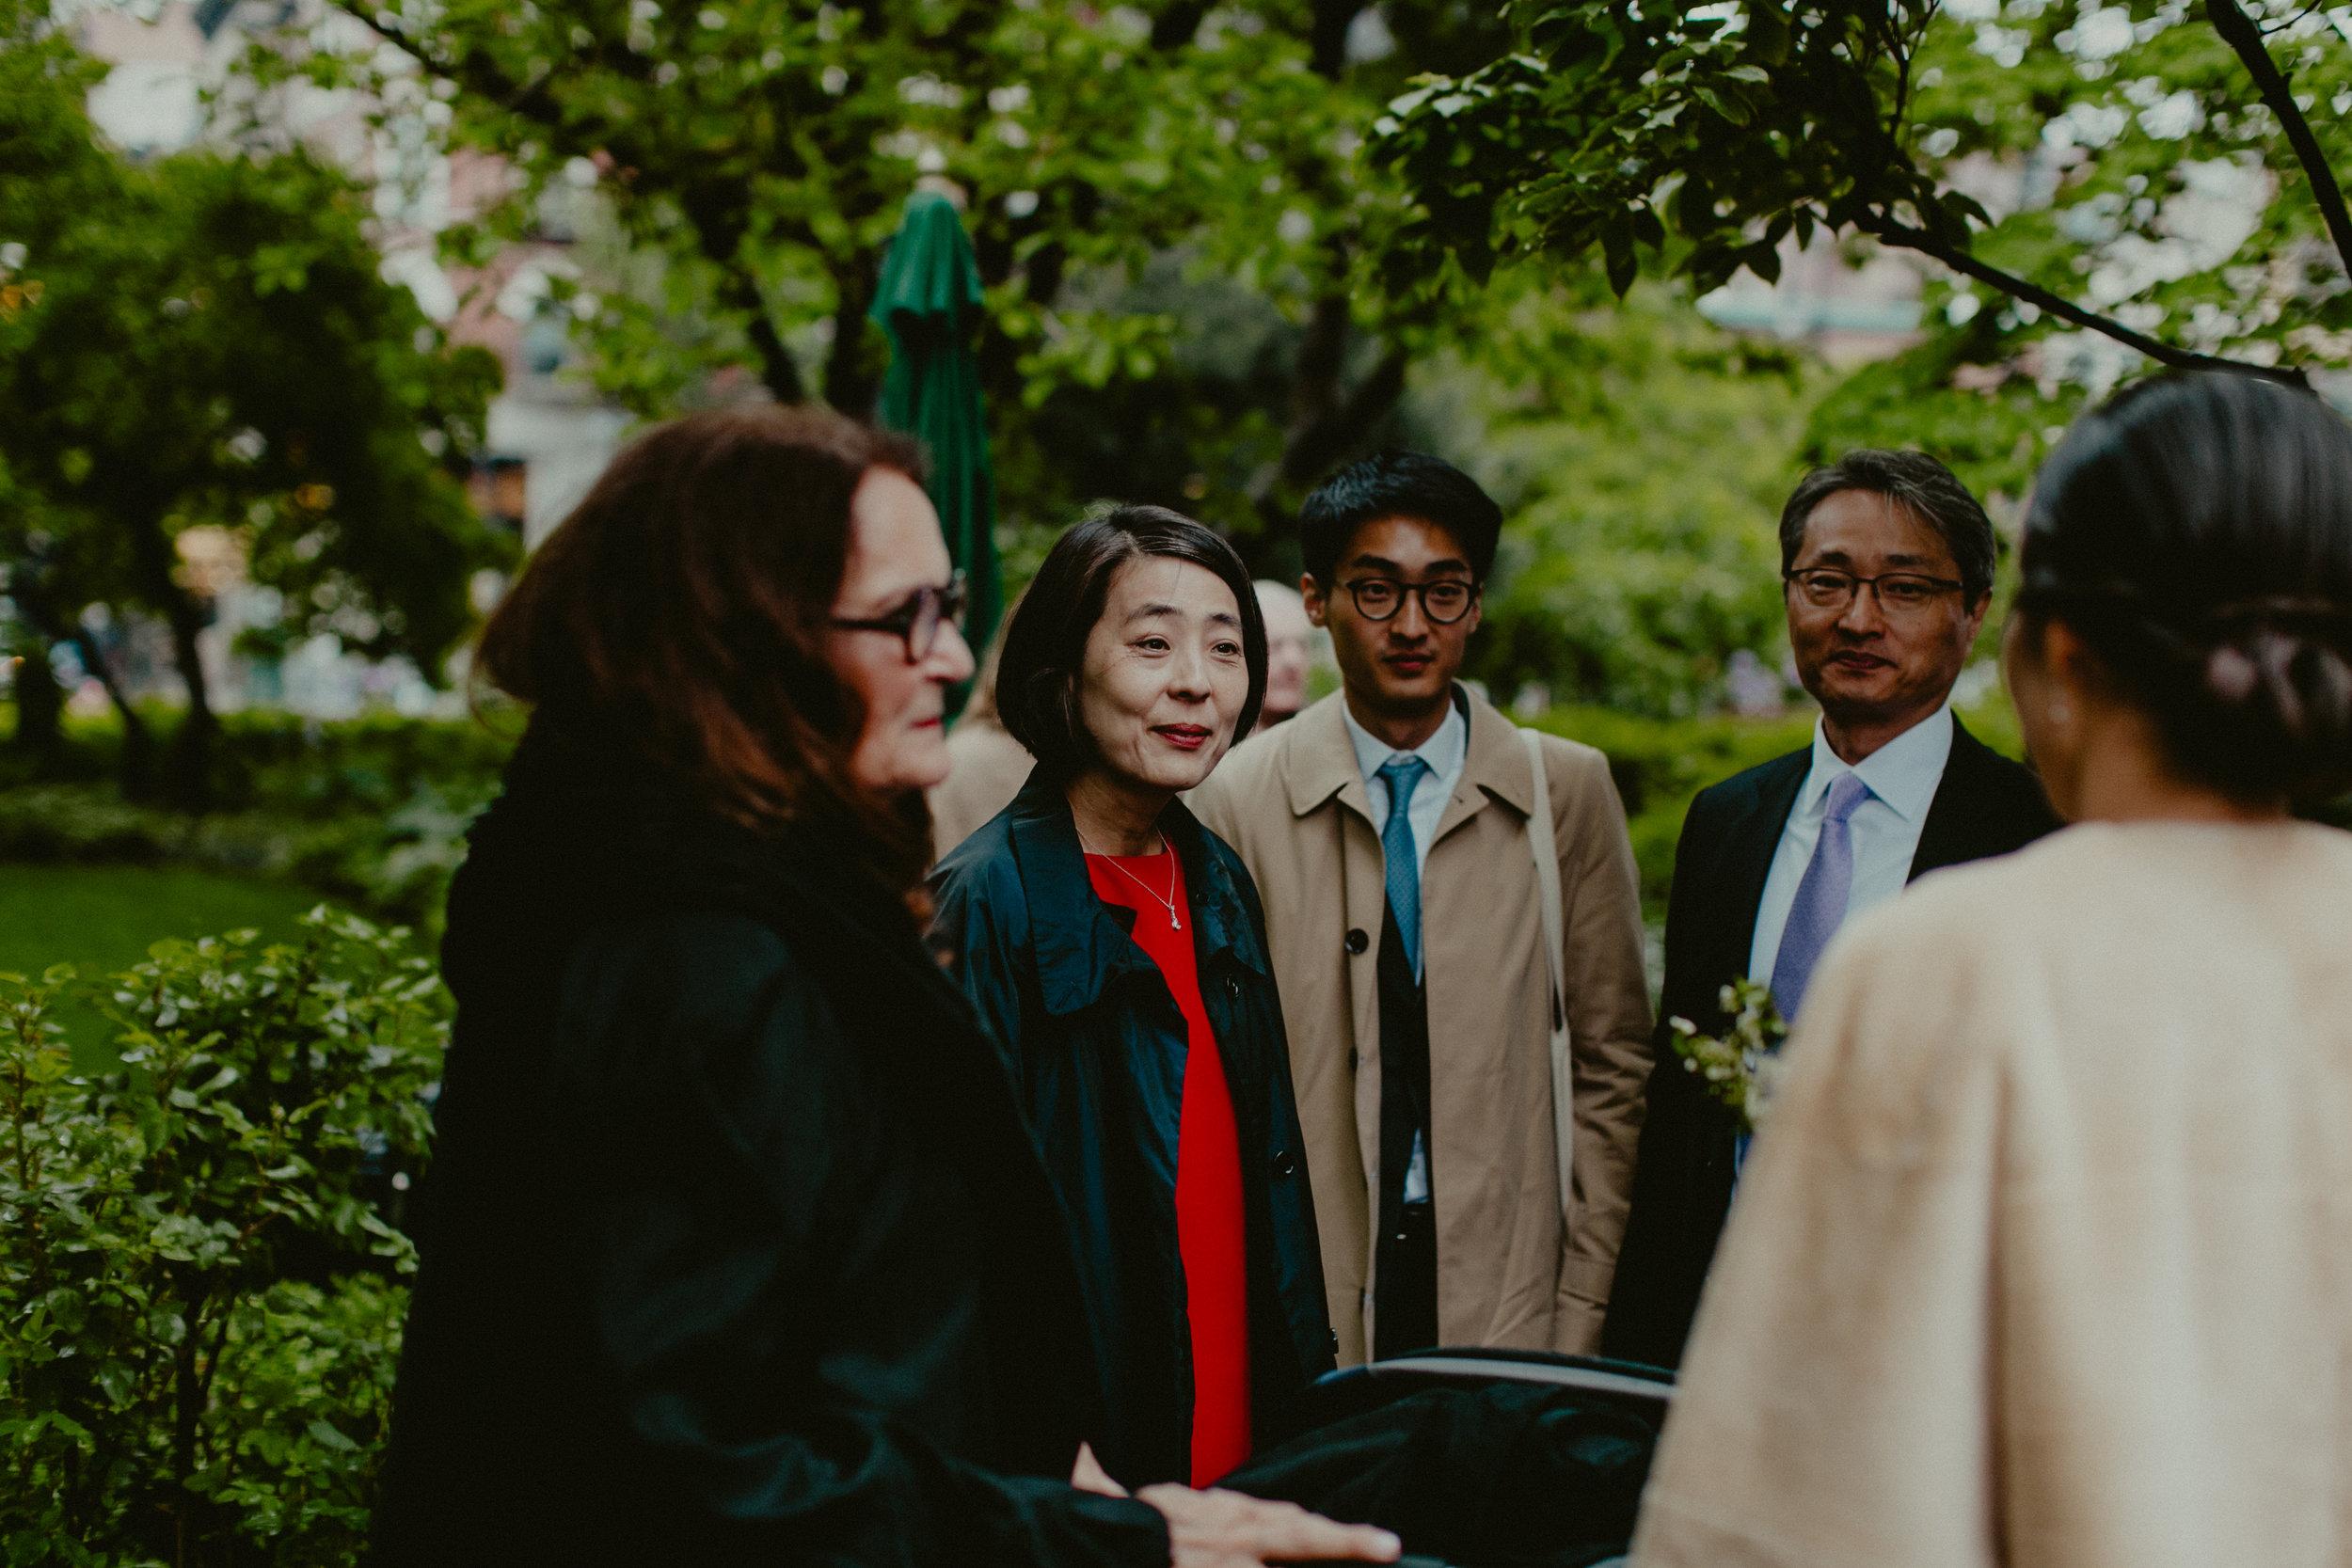 beekman hotel 445jefferson garden market wedding.JPG